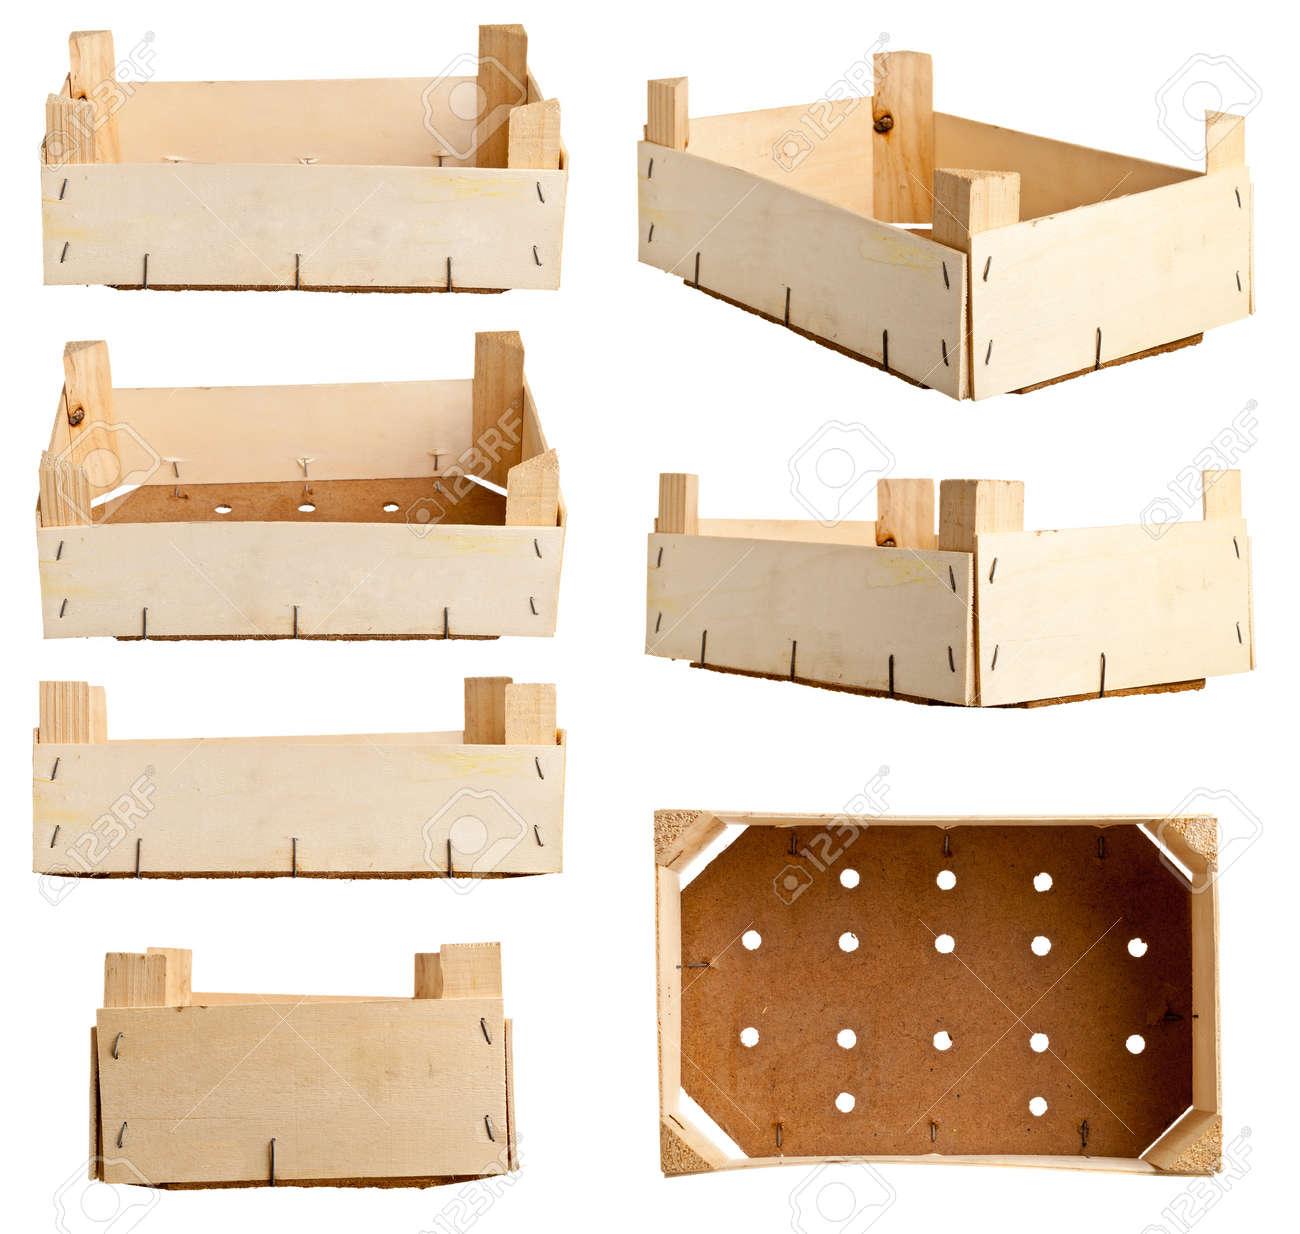 bandeja de fruta de madera o de cajas de madera reciclada diferentes variaciones aisladas sobre